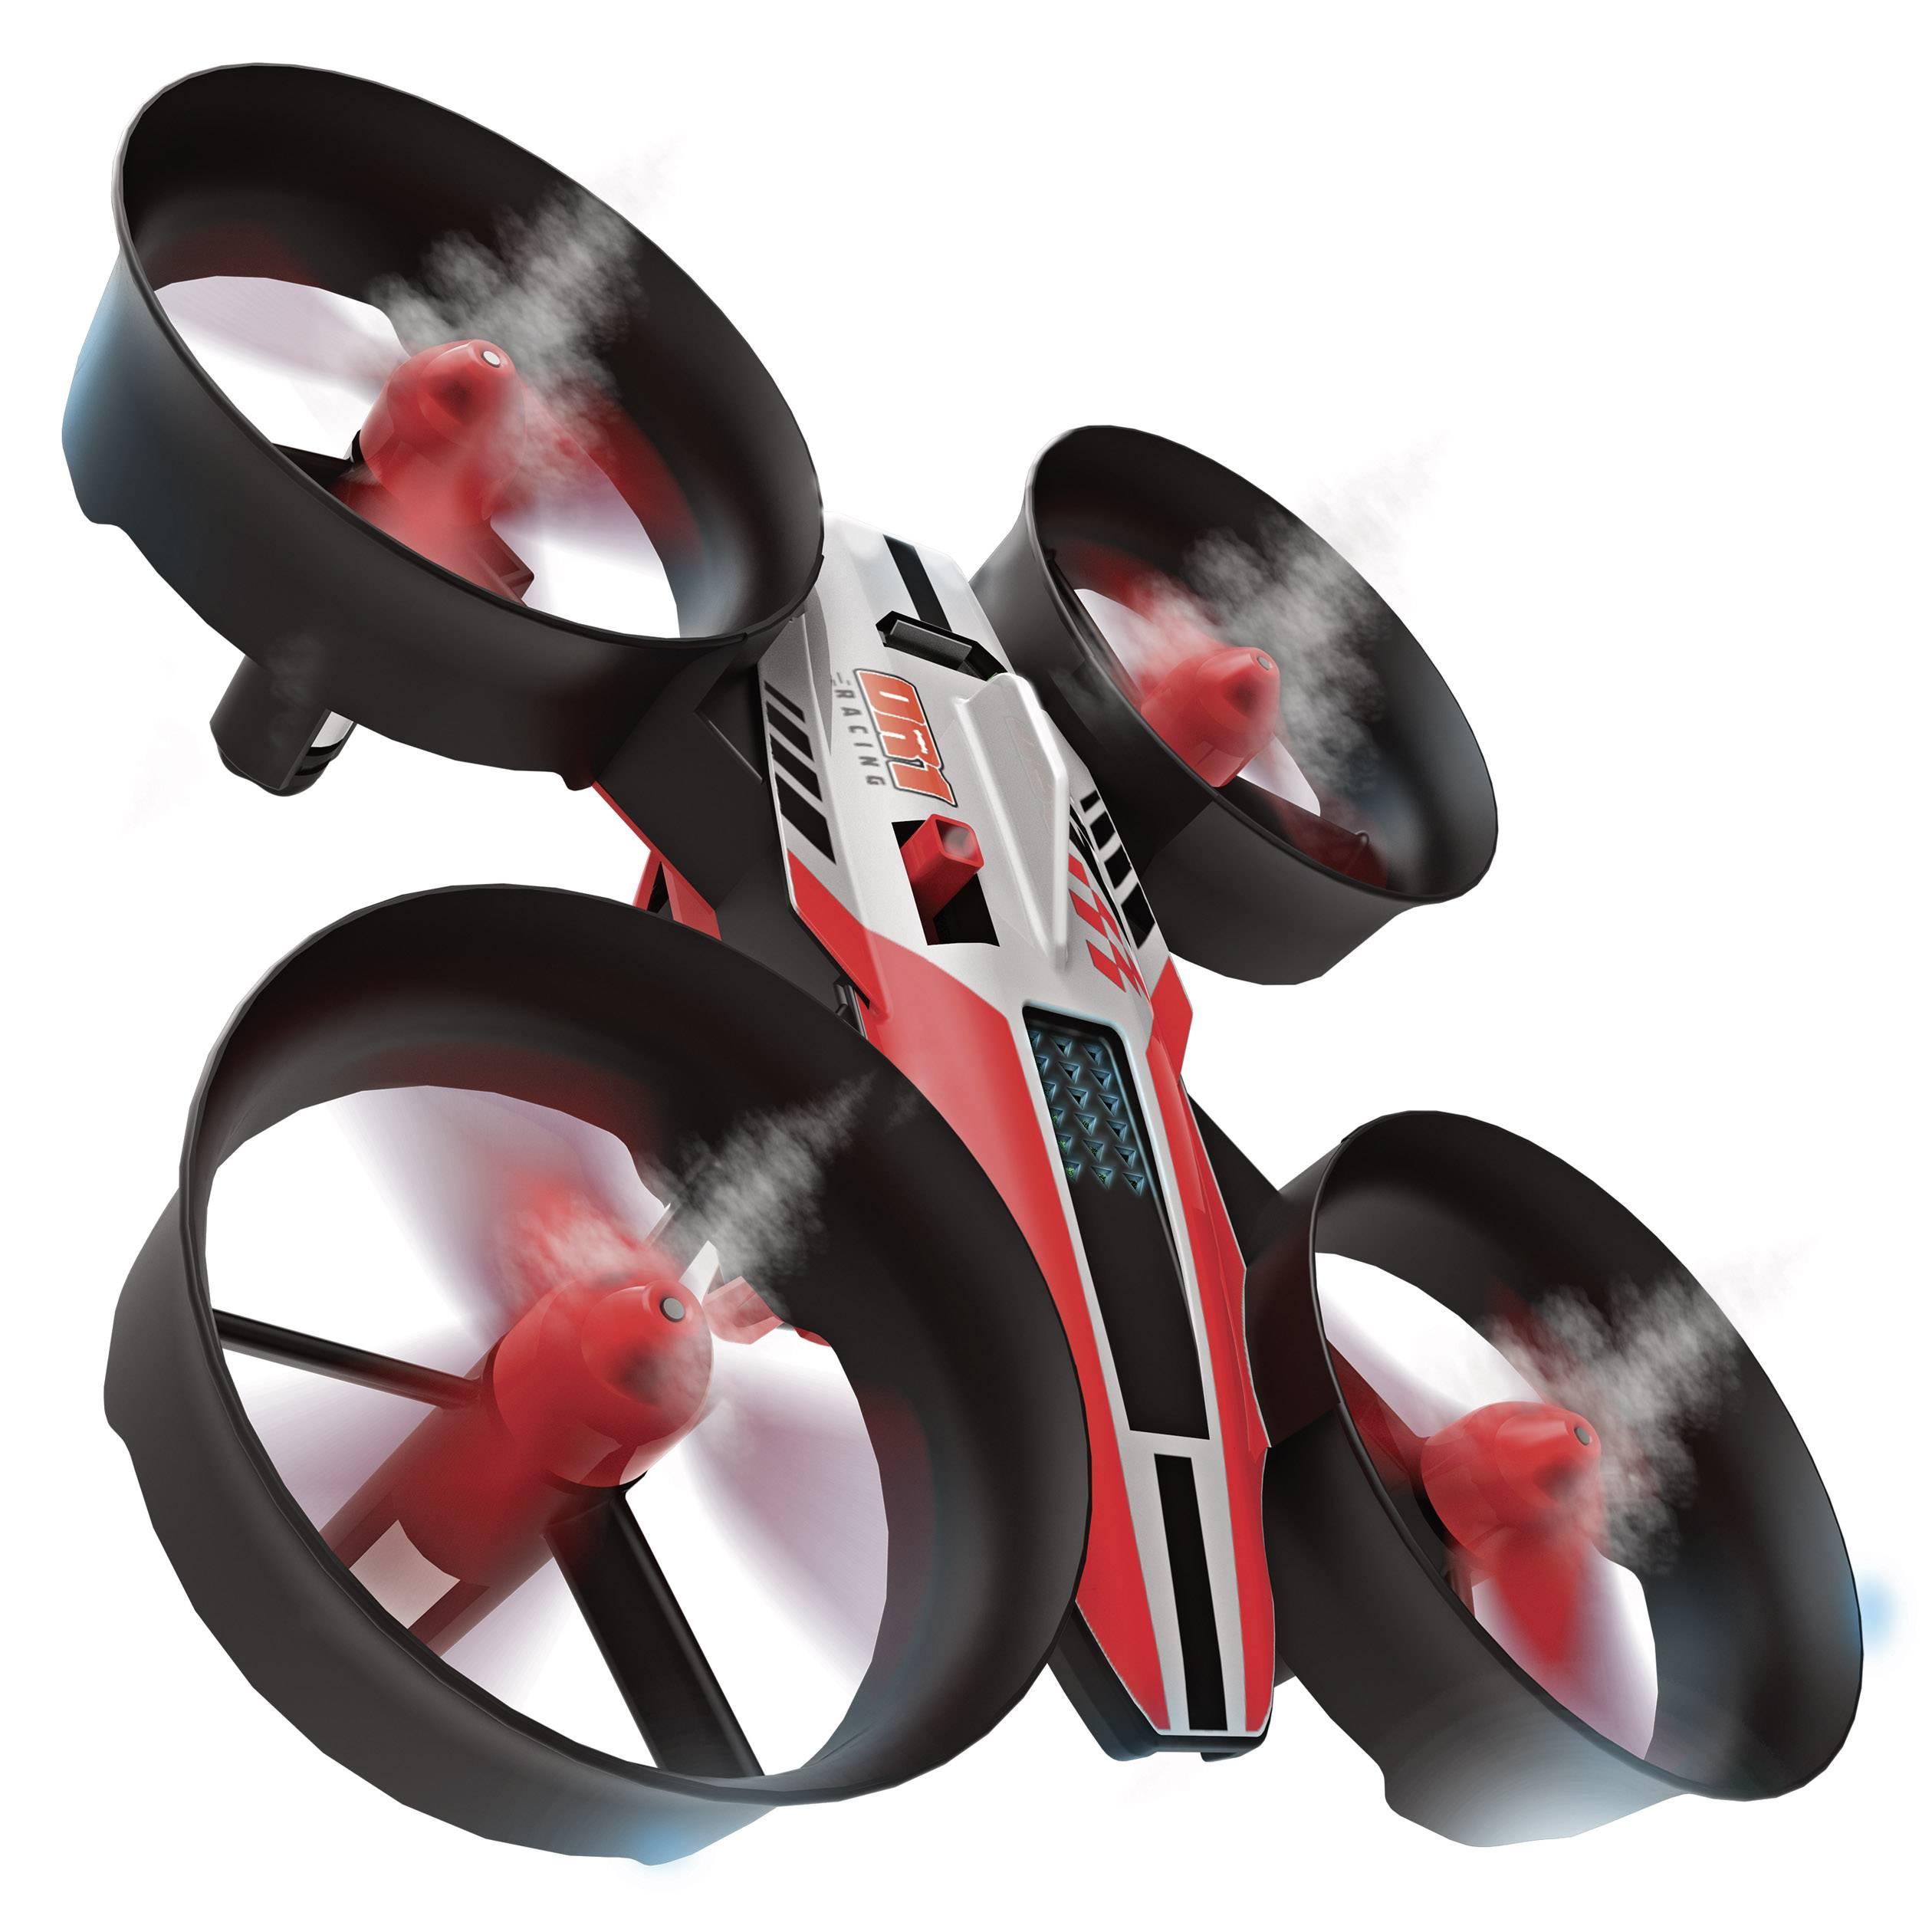 Dron Air Hogs DR1 FPV, FPV Race